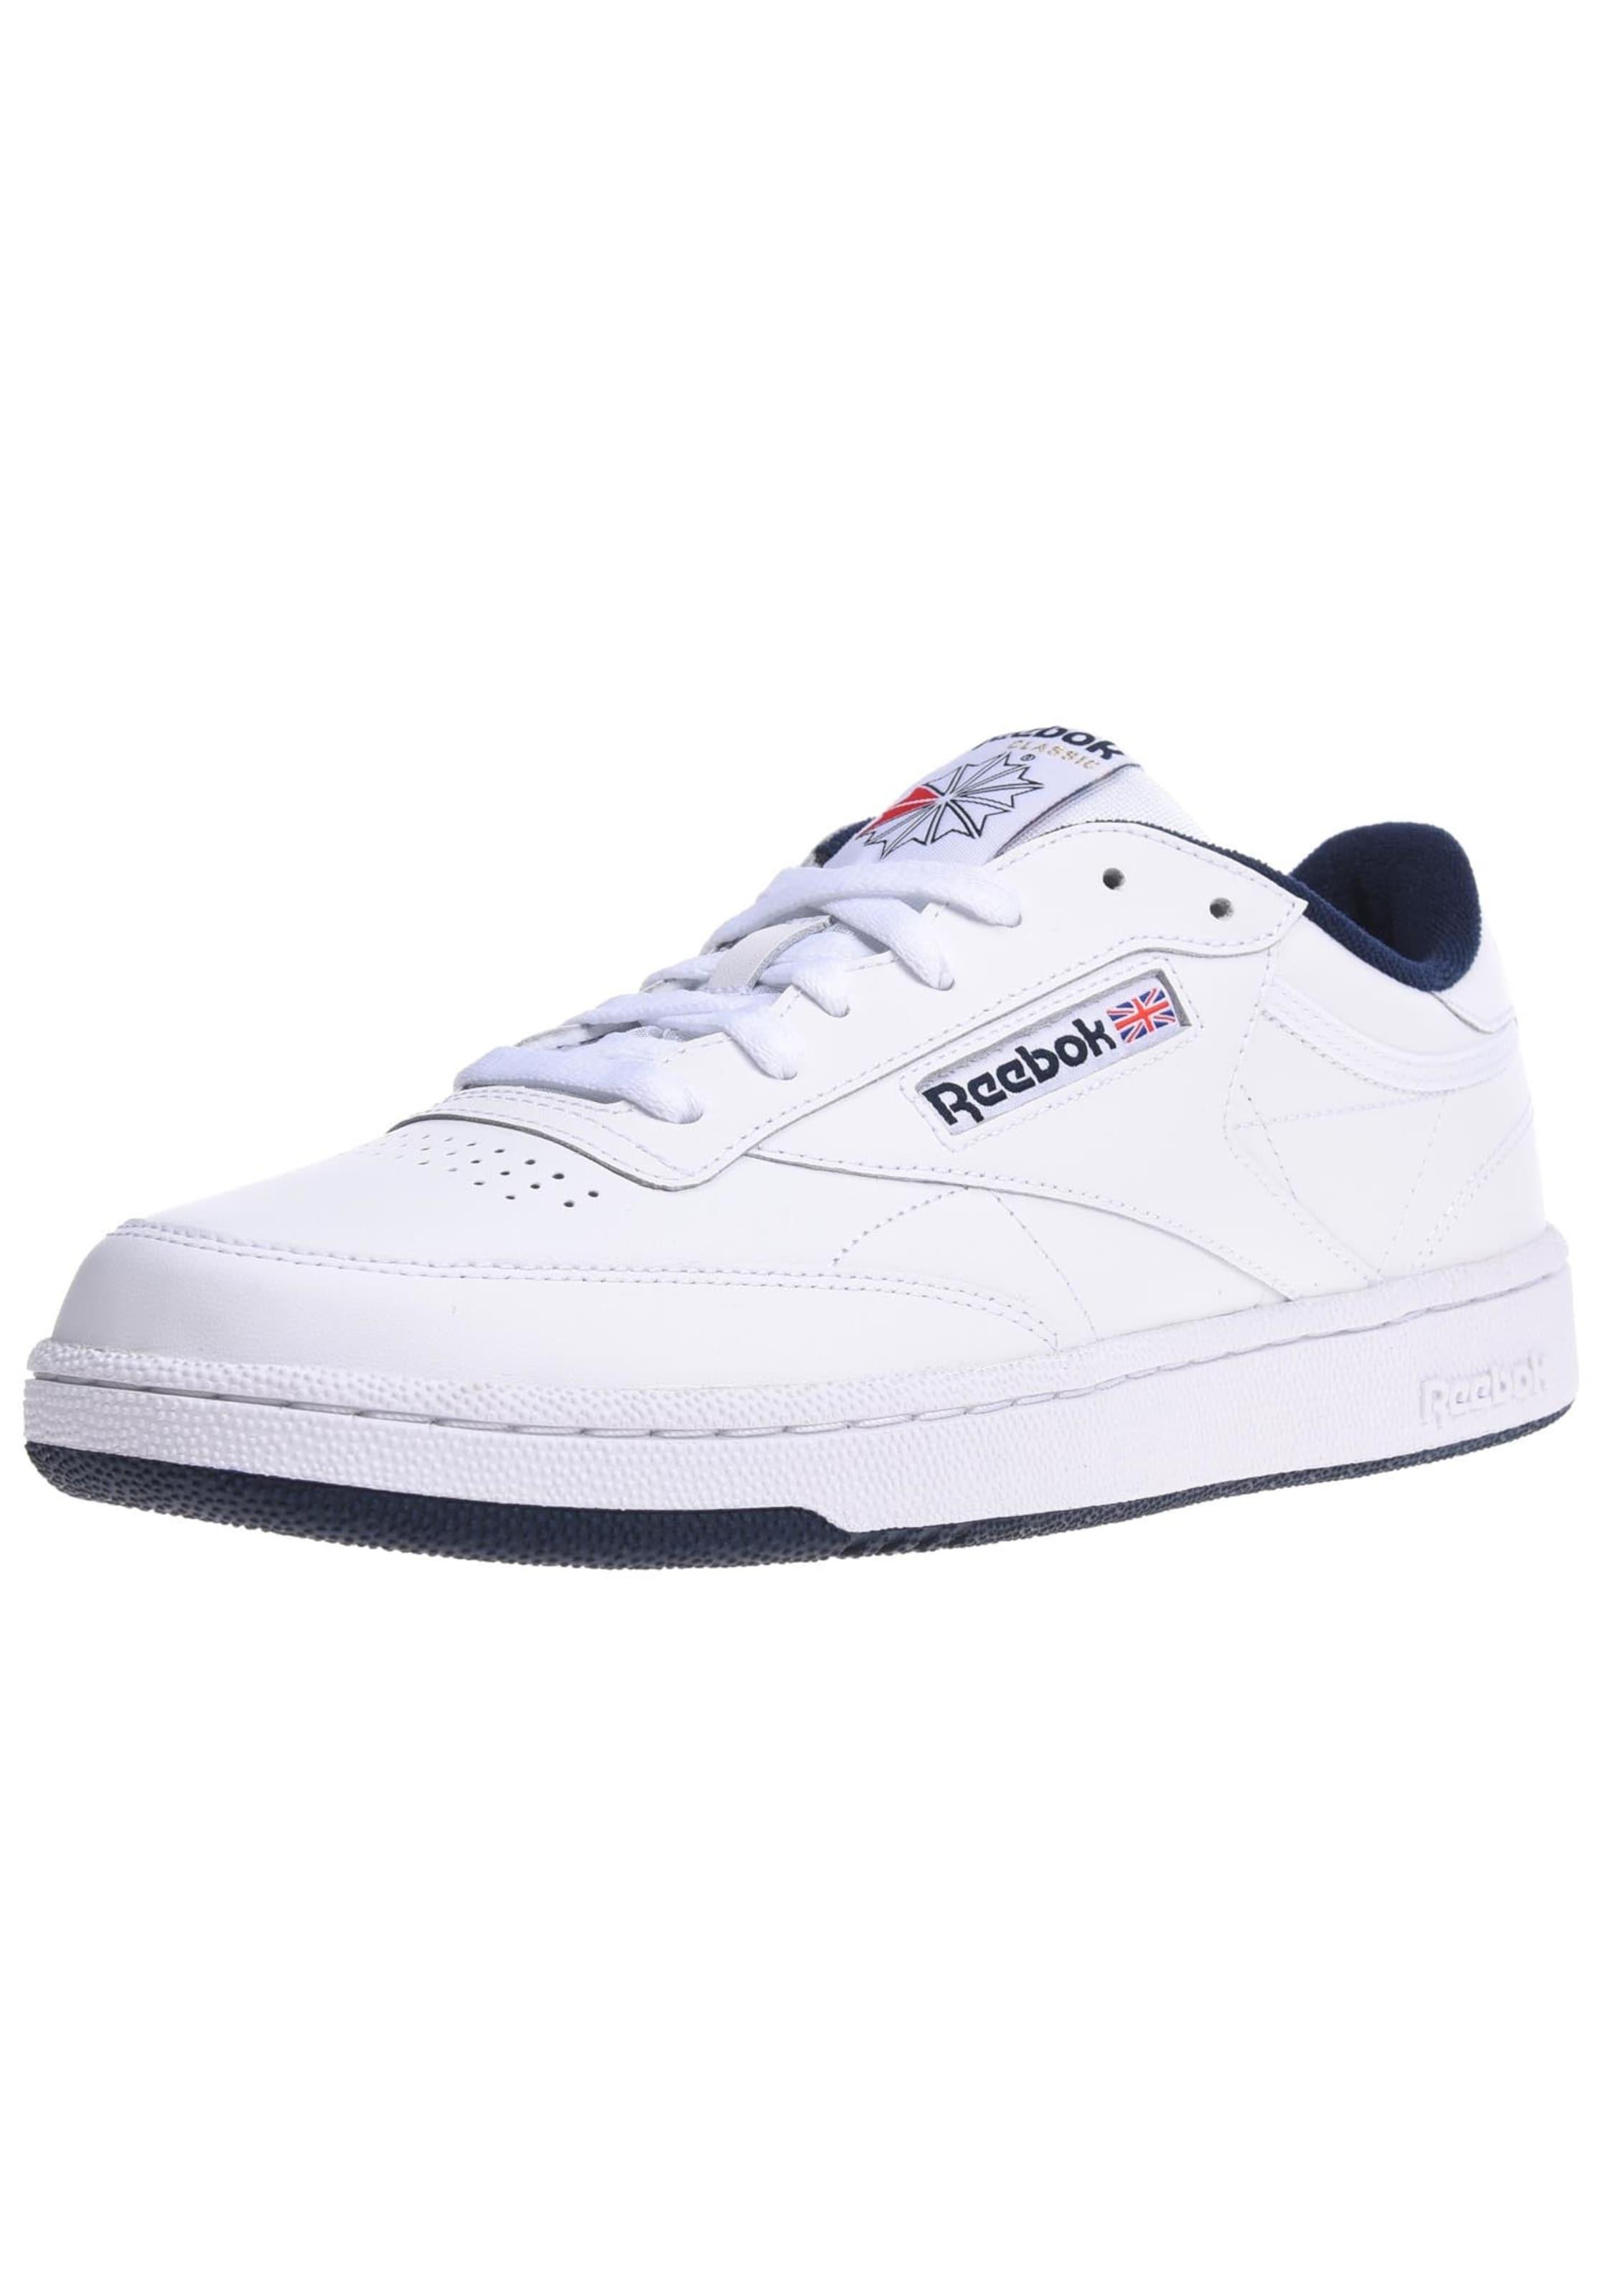 Classic C Weiß Reebok In 'club 85' Sneaker cA54qRL3j